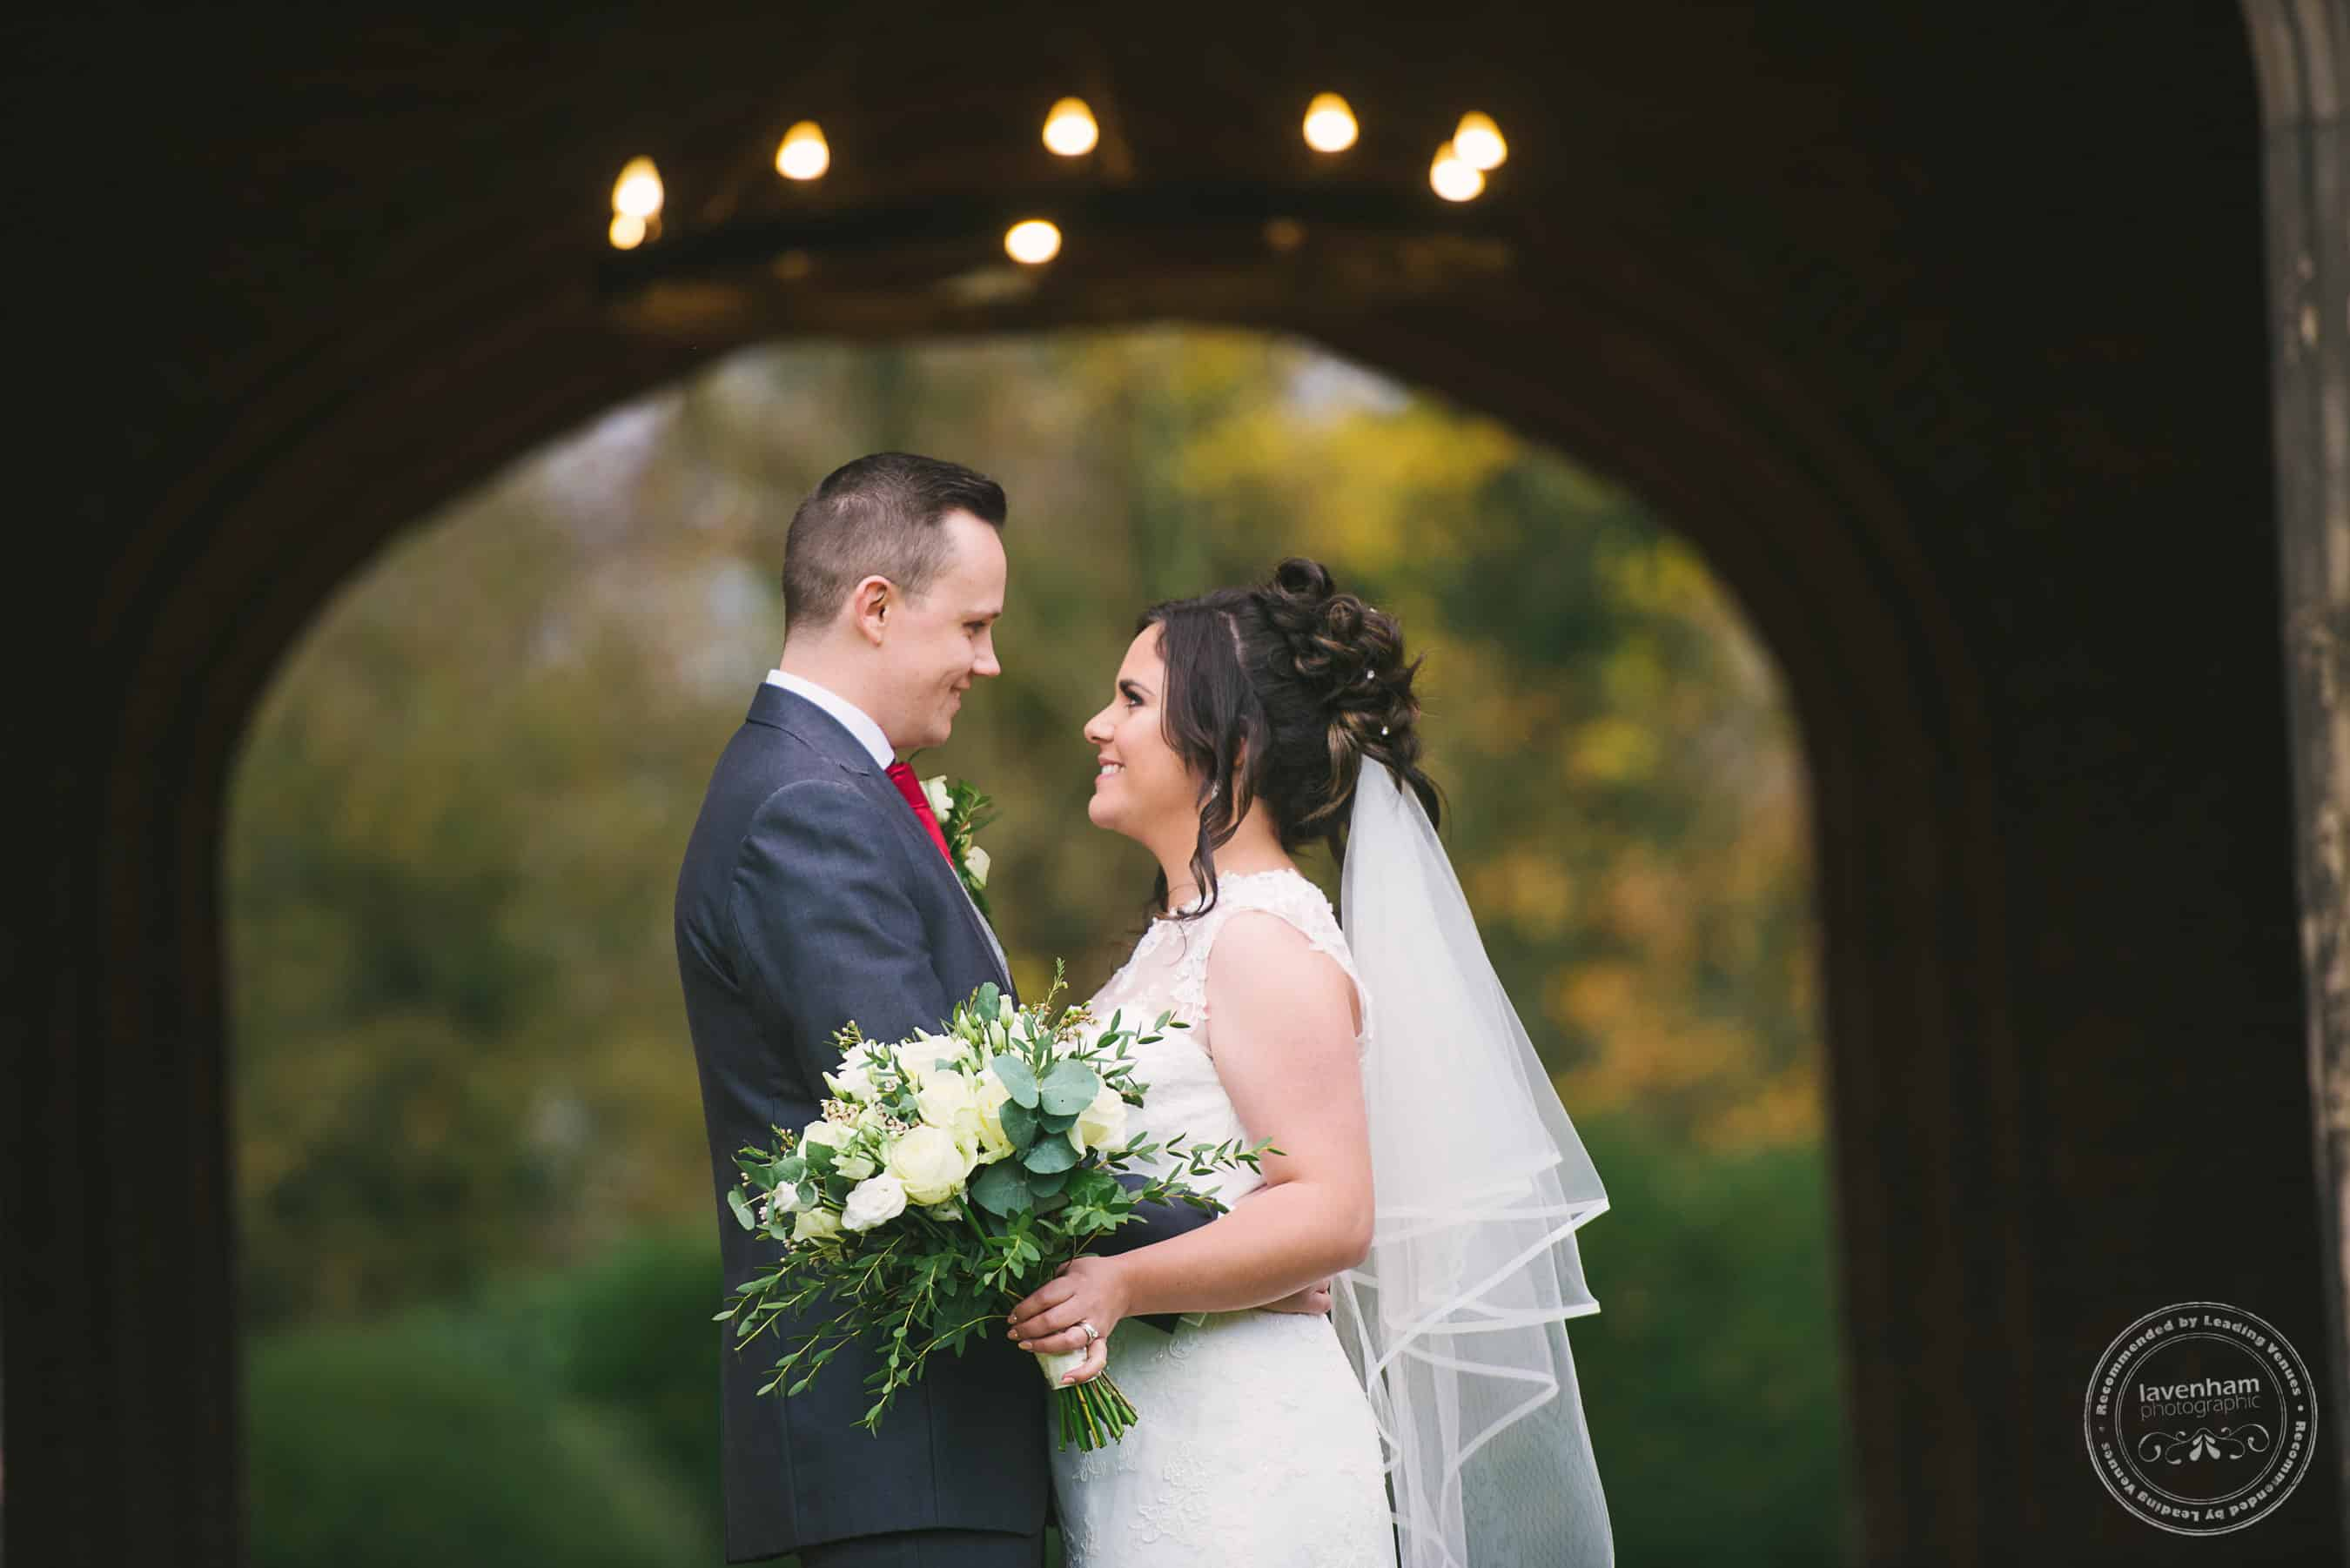 251118 Leez Priory Wedding Photography by Lavenham Photographic 091